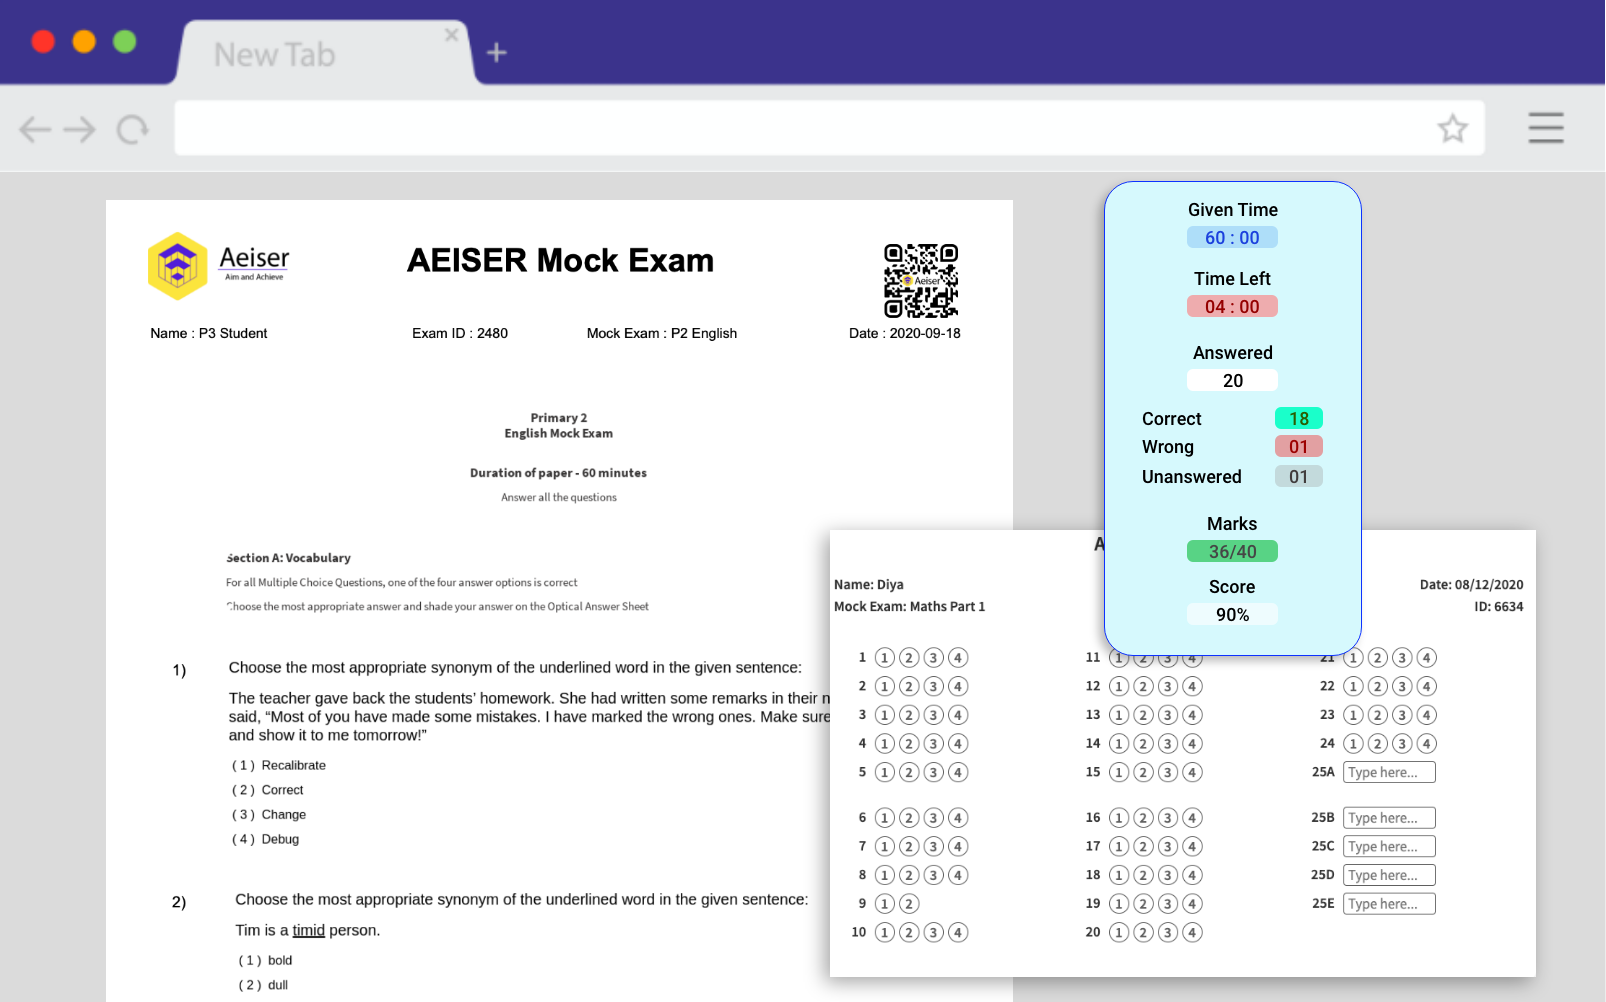 AEIS SAEIS Mock Exam paper